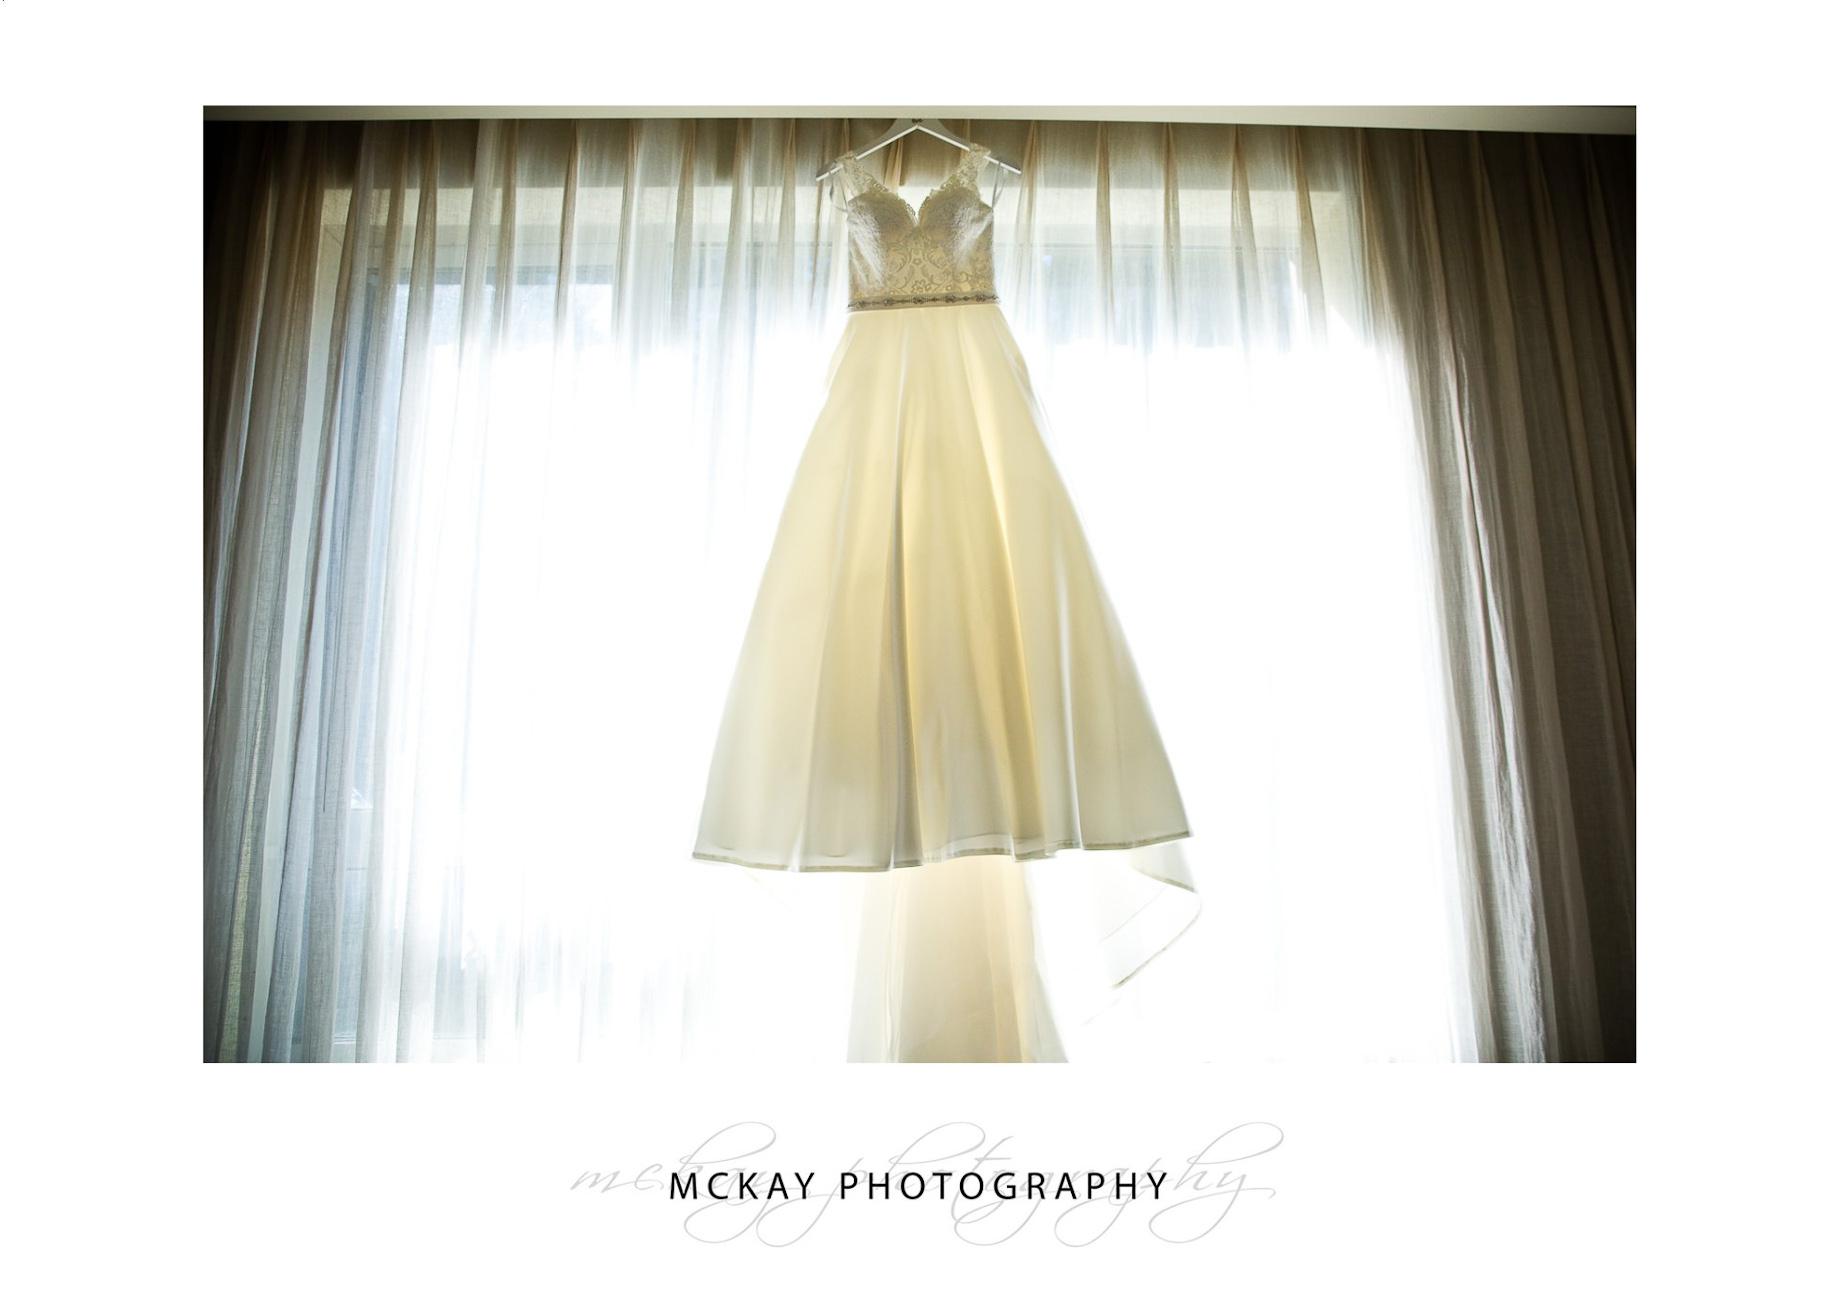 Bride dress hanging